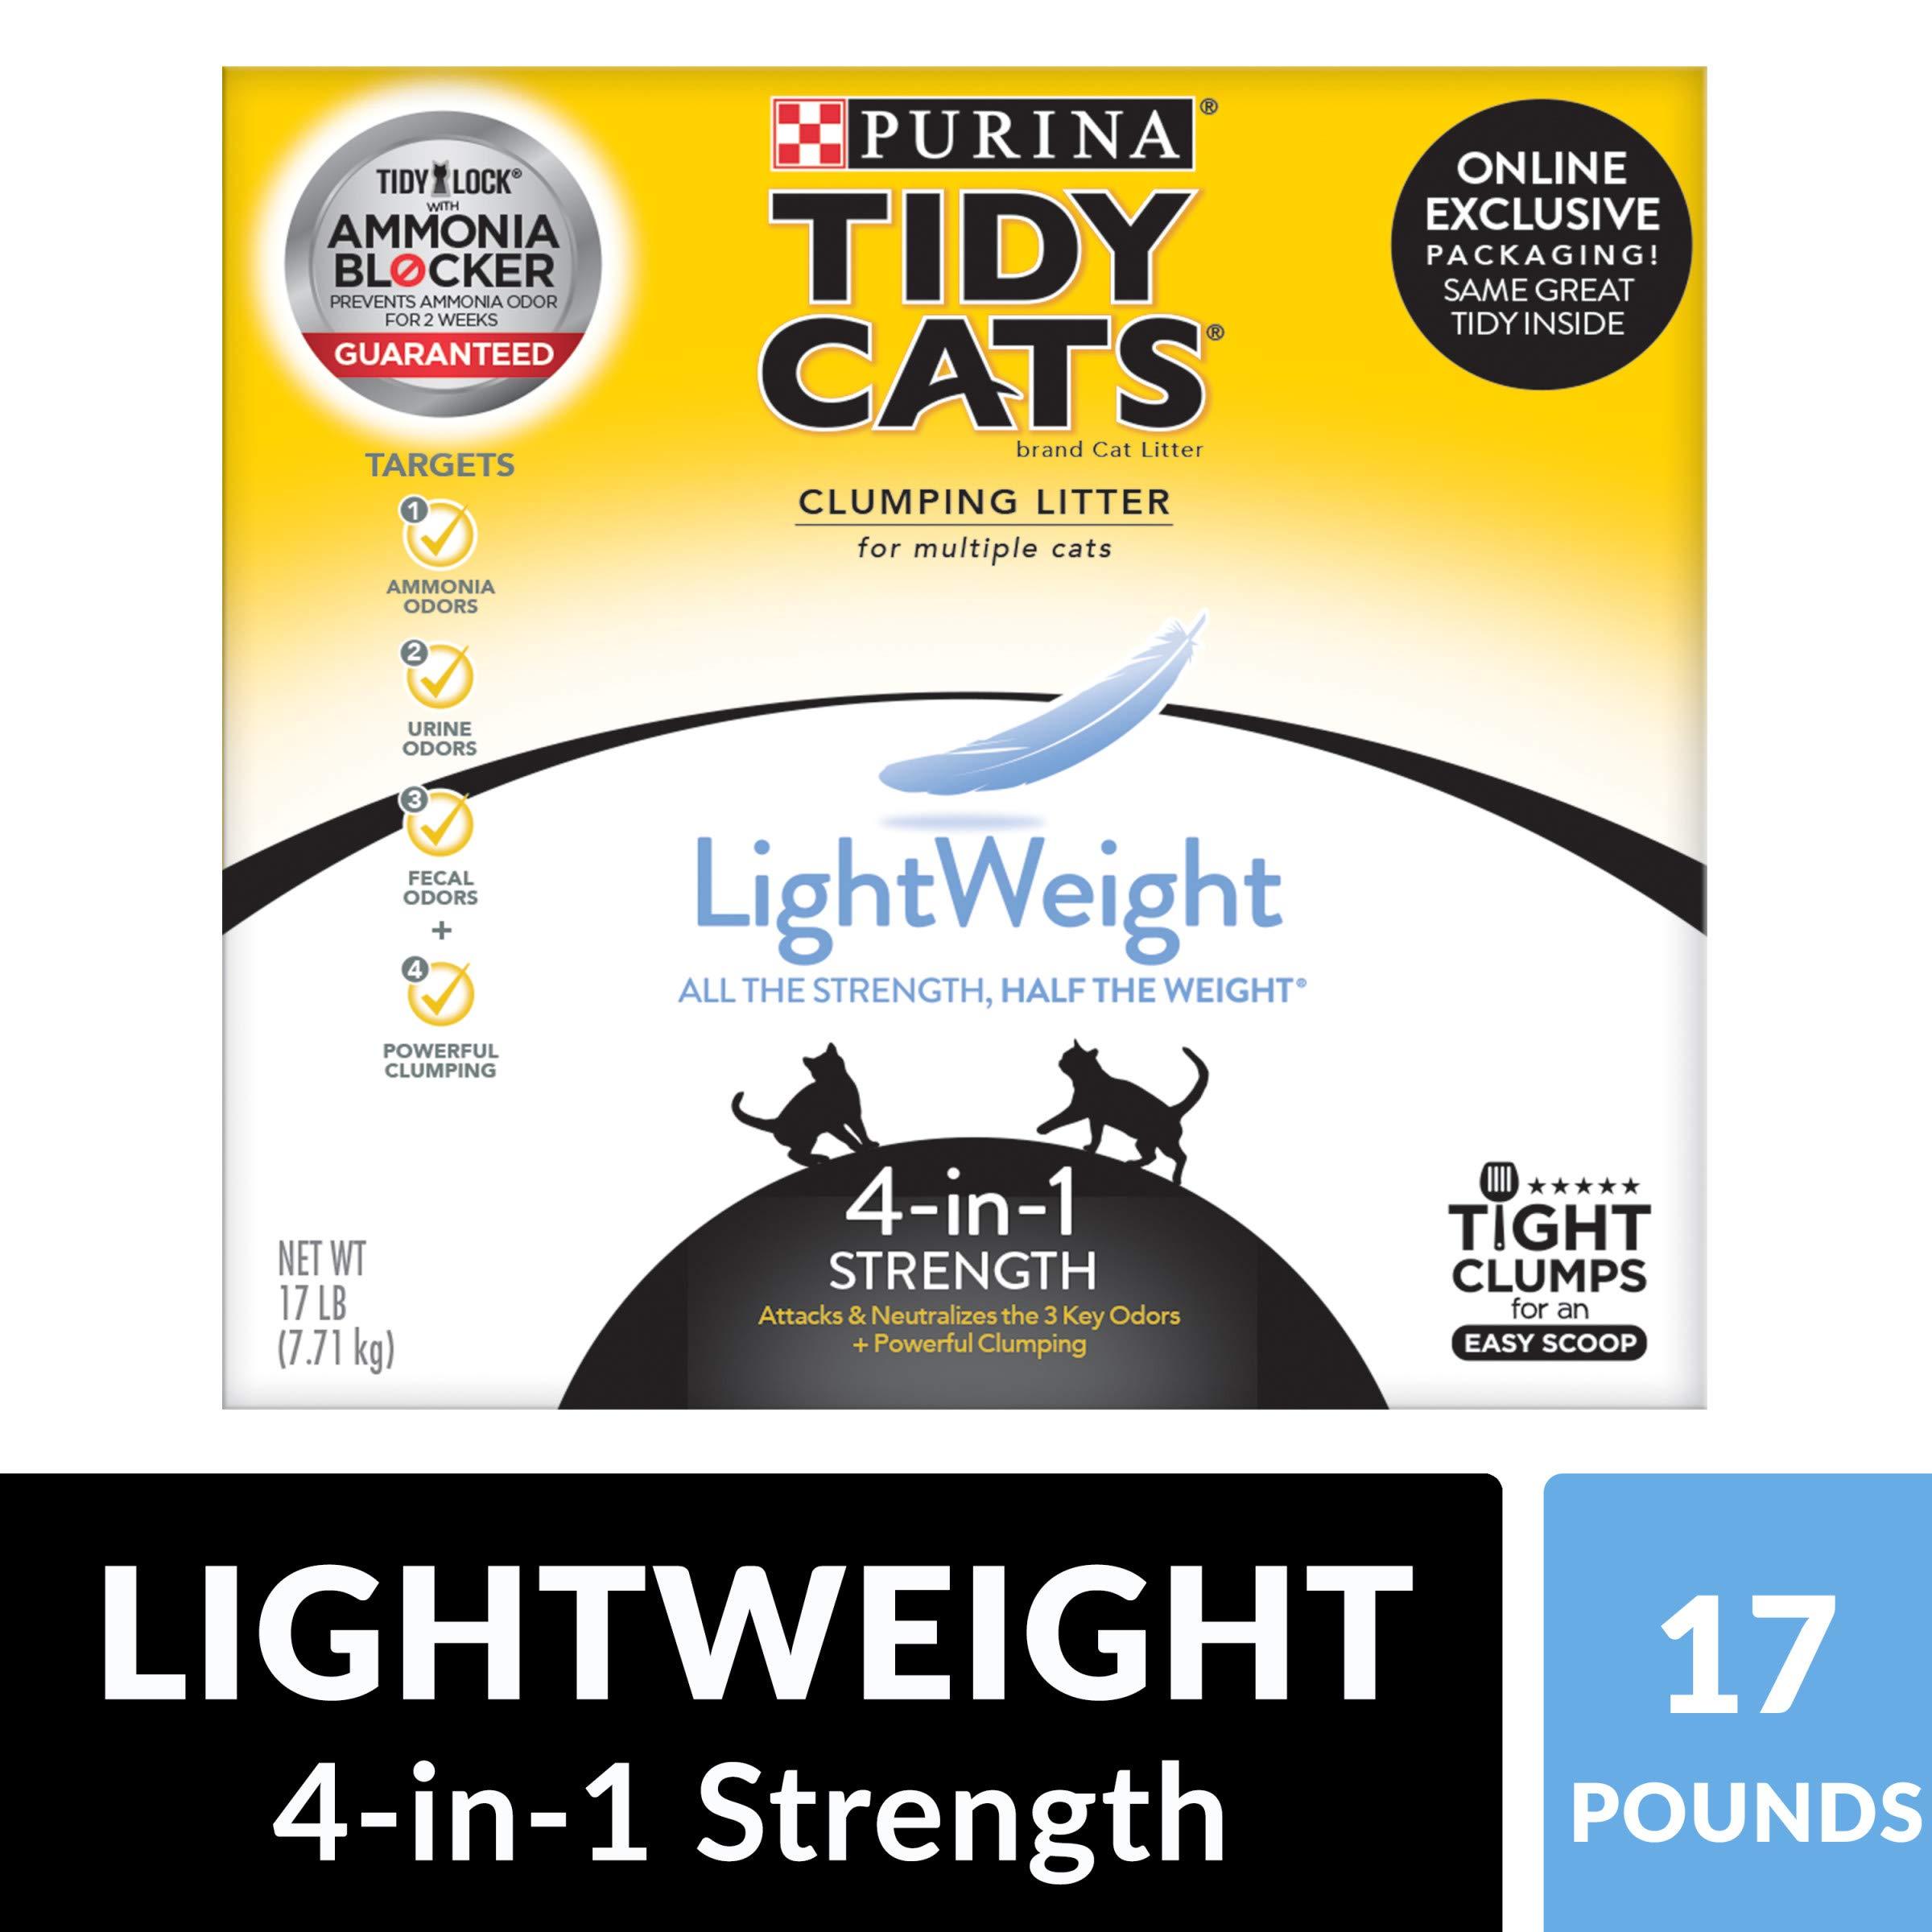 Purina Tidy Cats Light Weight, Dust Free, Clumping Cat Litter; LightWeight 4-in-1 Strength Multi Cat Litter - 17 lb. Box